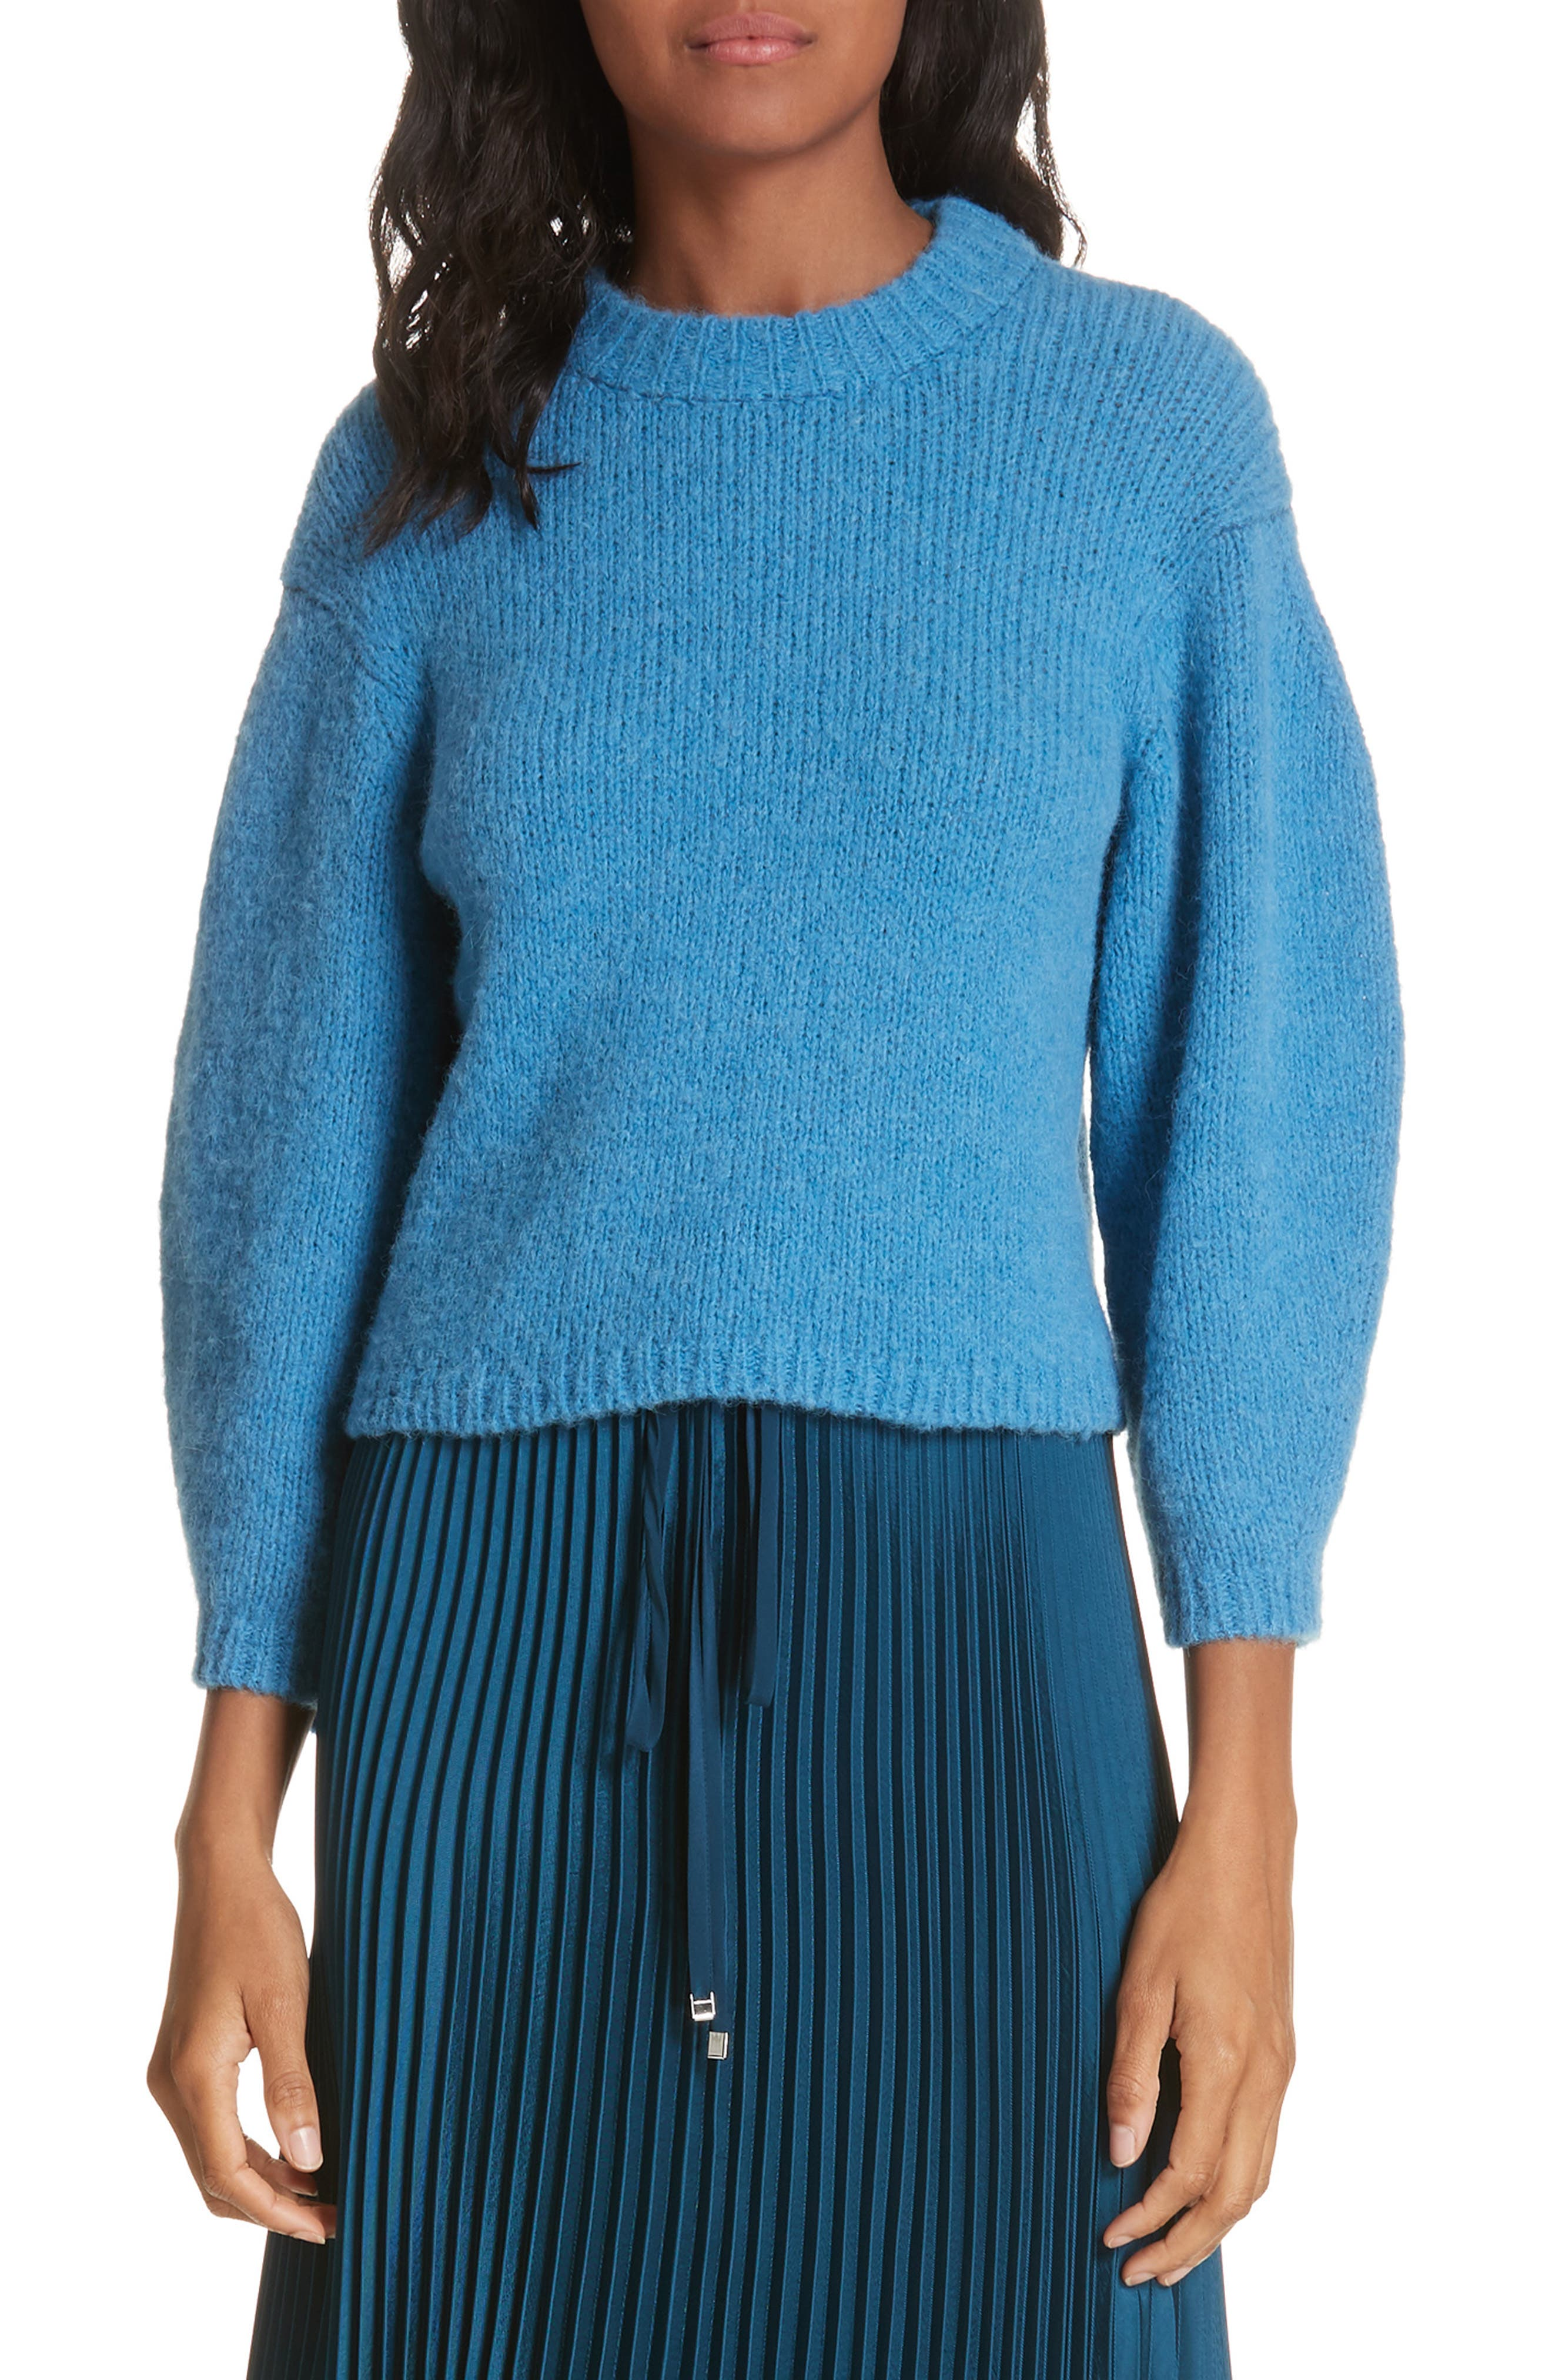 Tibi Cozette Alpaca & Wool Blend Crop Sweater, Blue